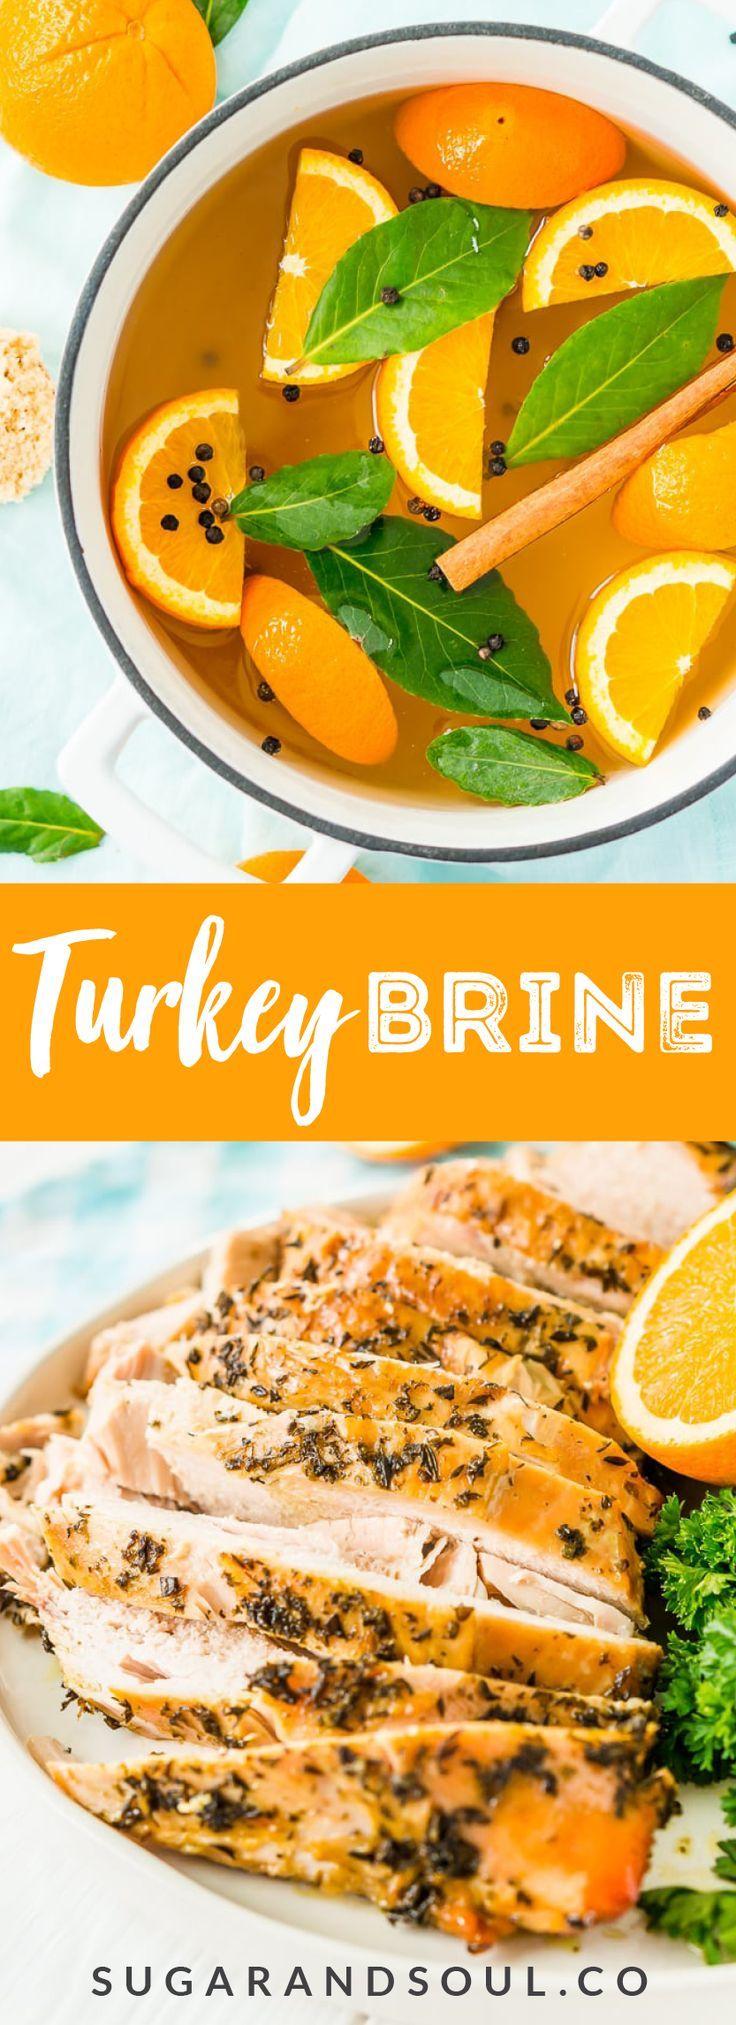 This Turkey Brine recipe made with salt oranges bay leavescinnamon brown s  Sugar  Soul